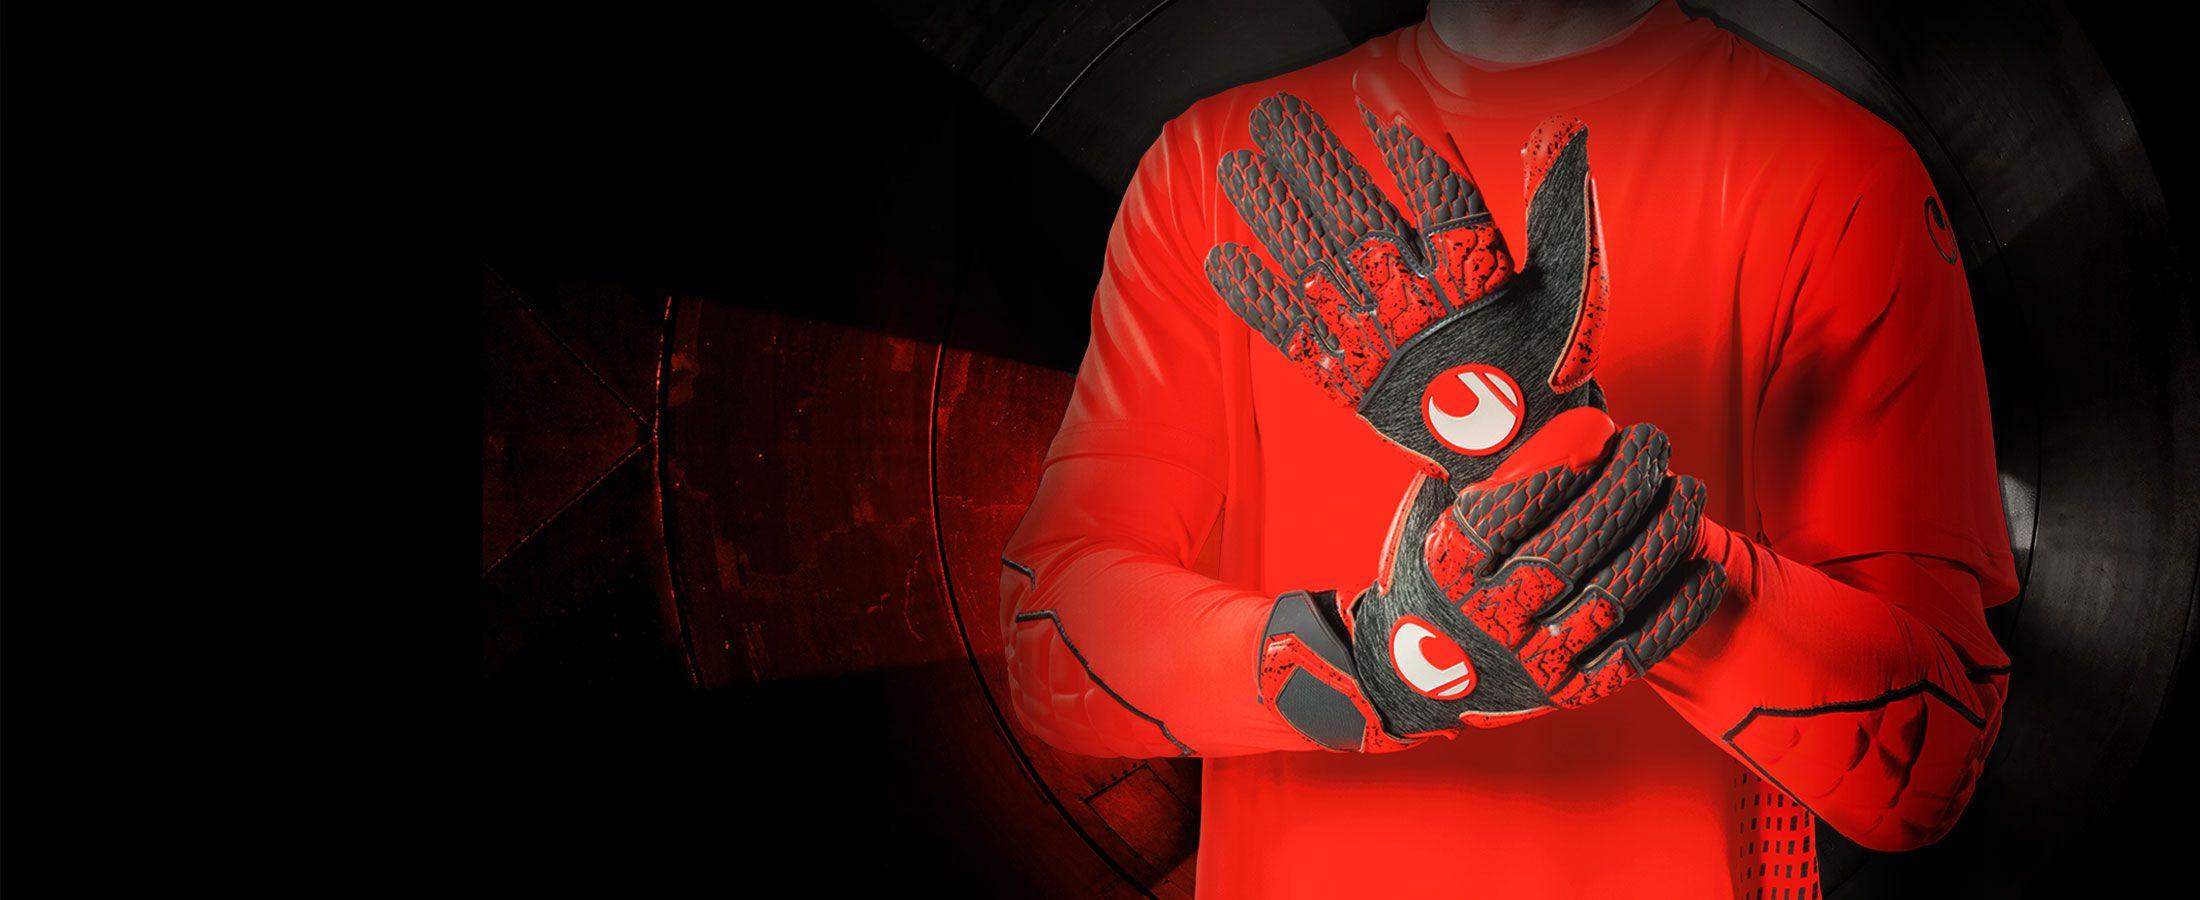 Nuevos guantes Uhlsport